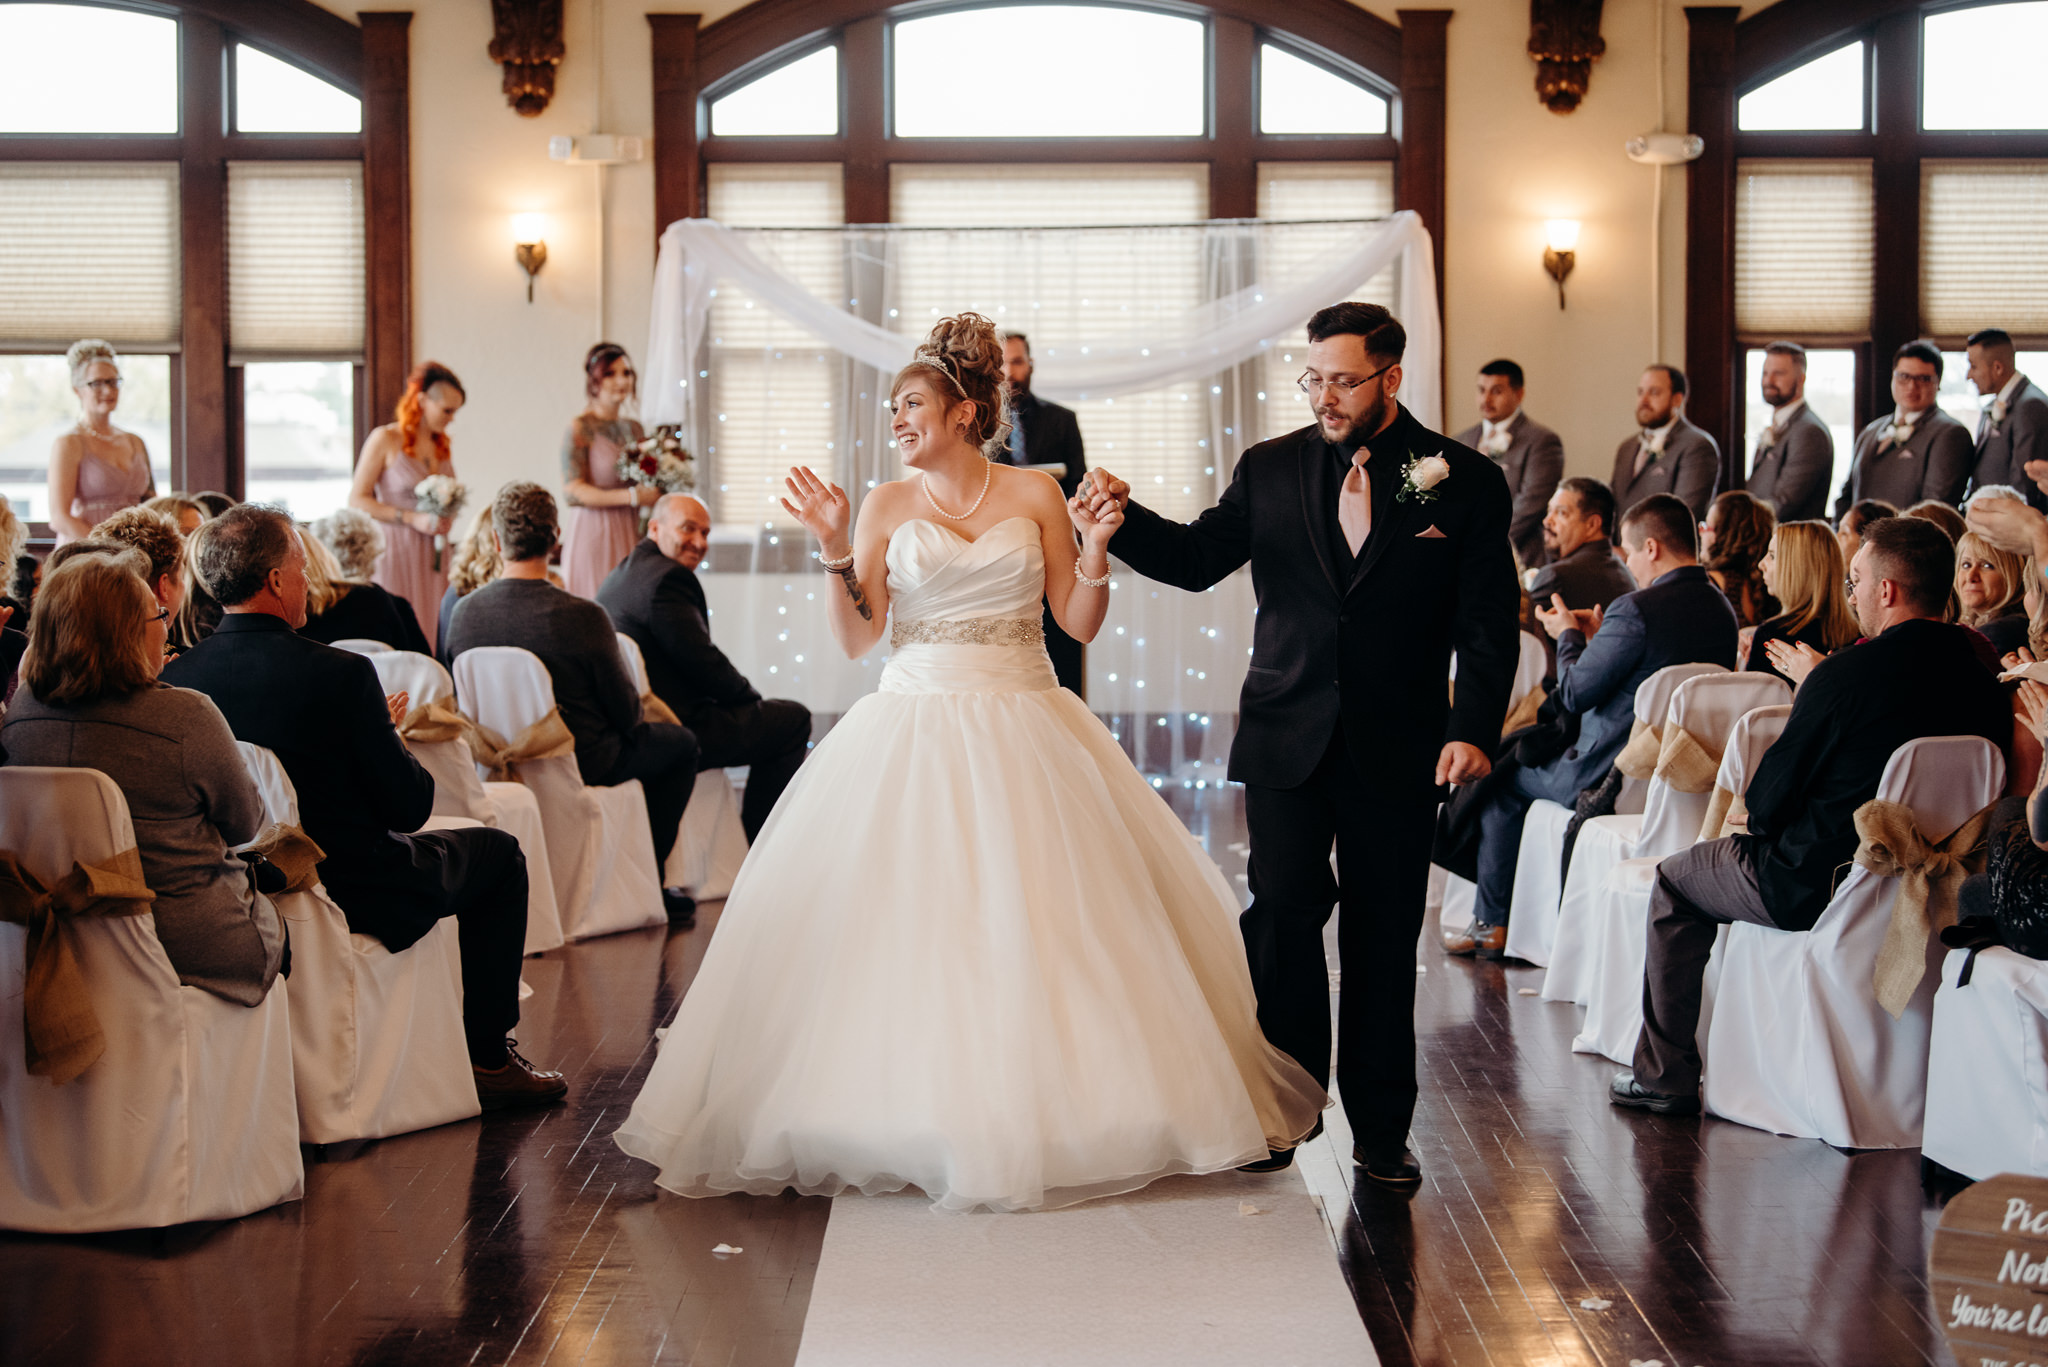 Grant Beachy Photo portrait wedding goshen elkhart south bend chicago-027.jpg